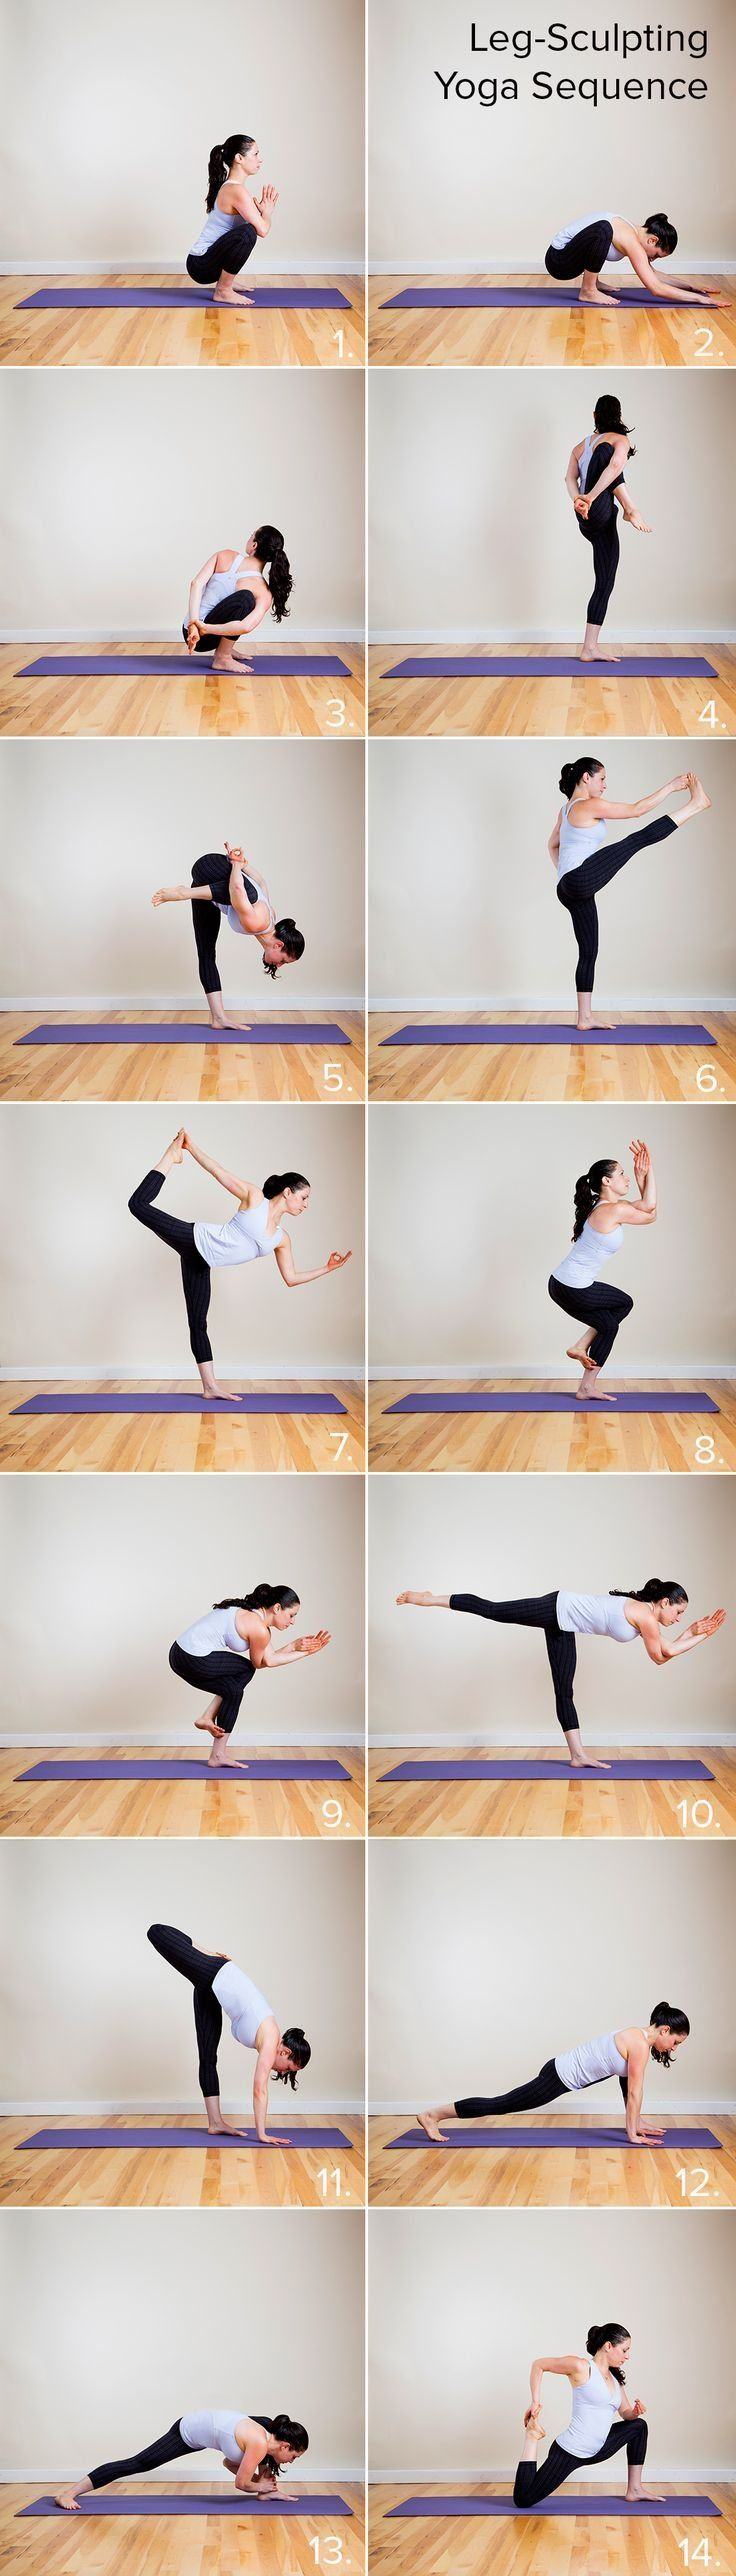 Yoga elevates brain GABA levels